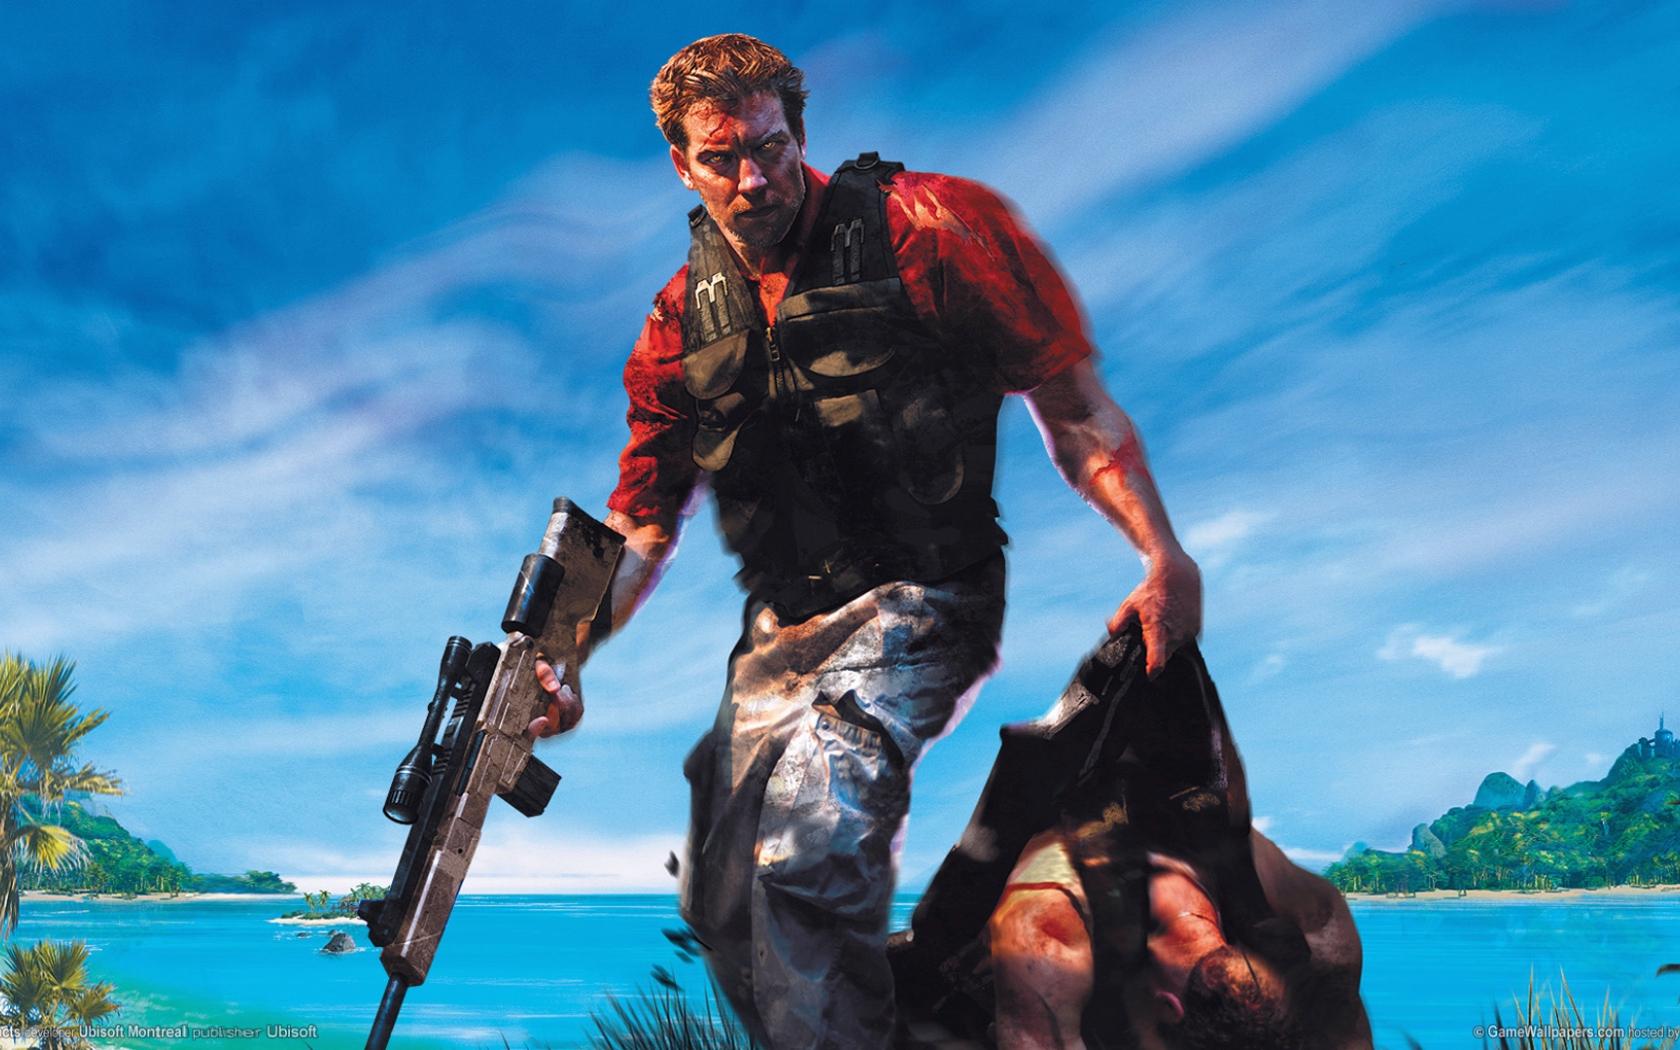 Desktop Wallpaper Far Cry Instincts Video Game 2005 Game Hd